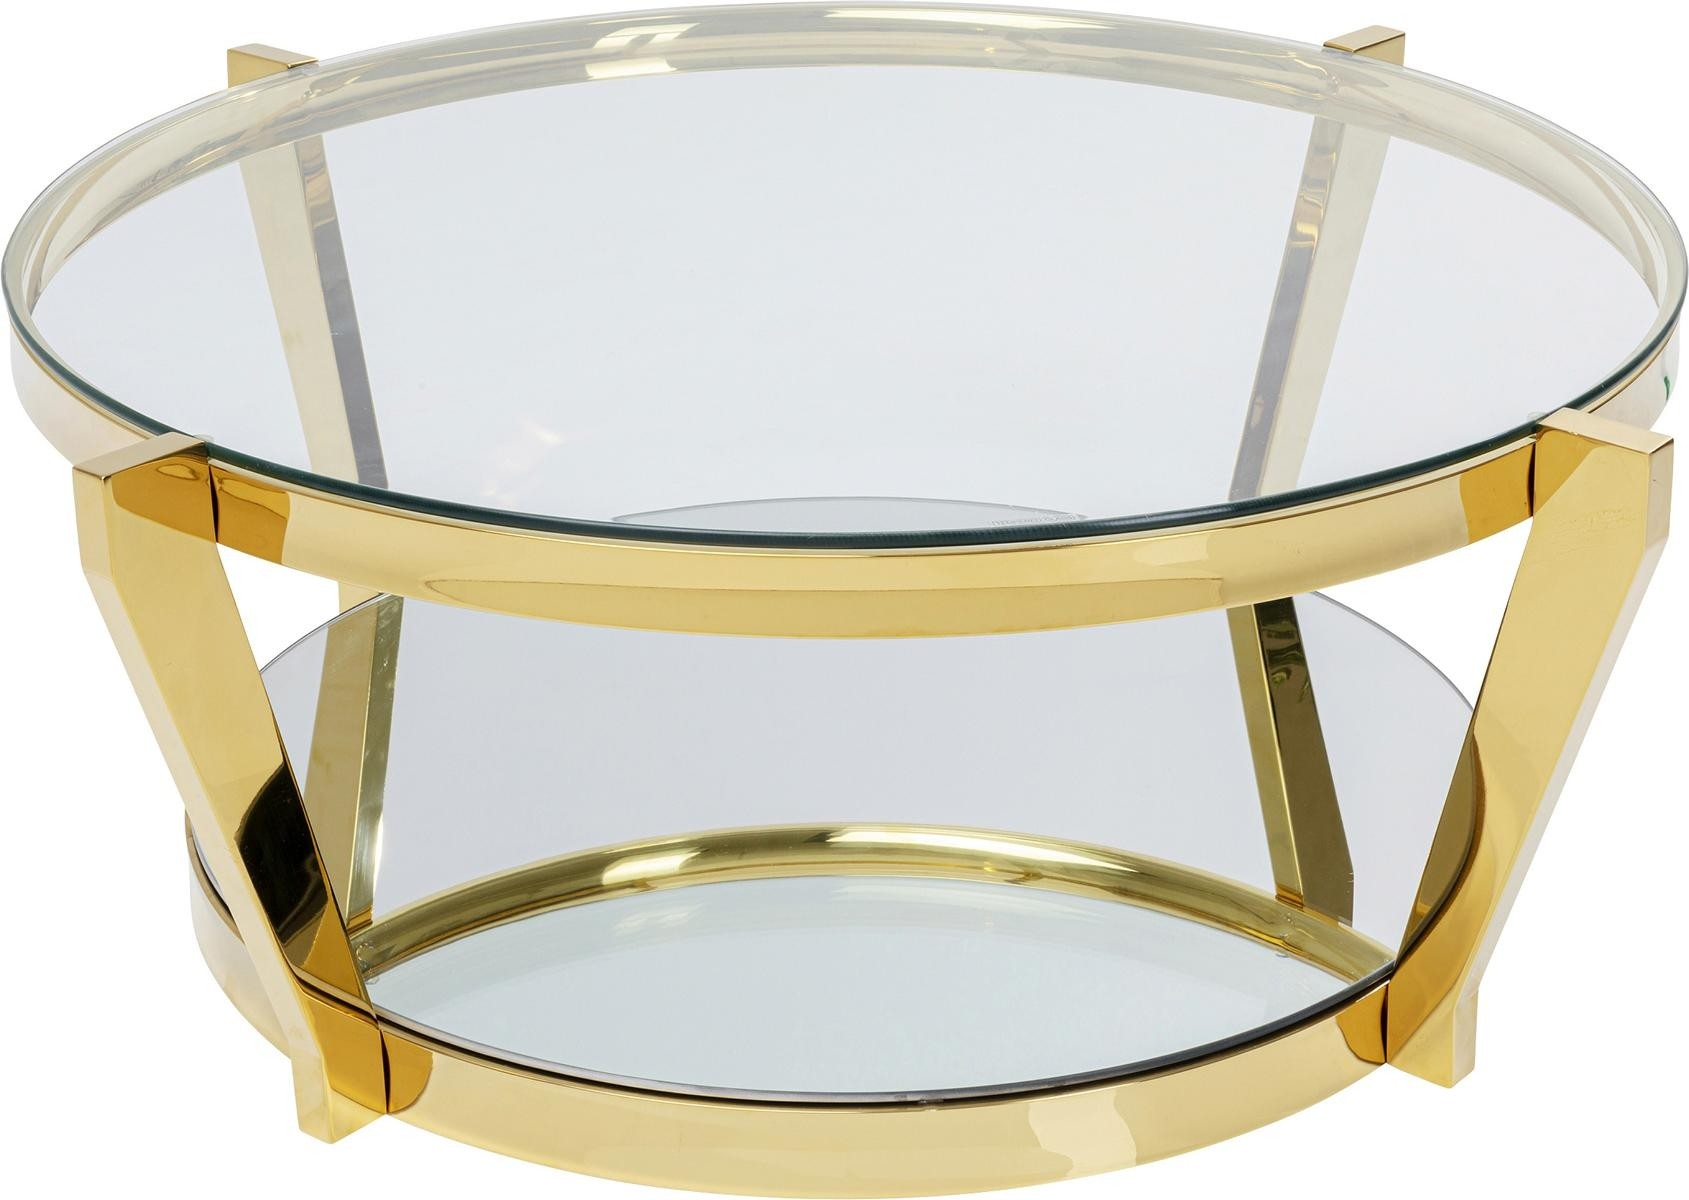 Kare Design Monocolo Ronde Salontafel Diameter 90 Cm - Glazen Tafelblad - Goudkleurig Metaal